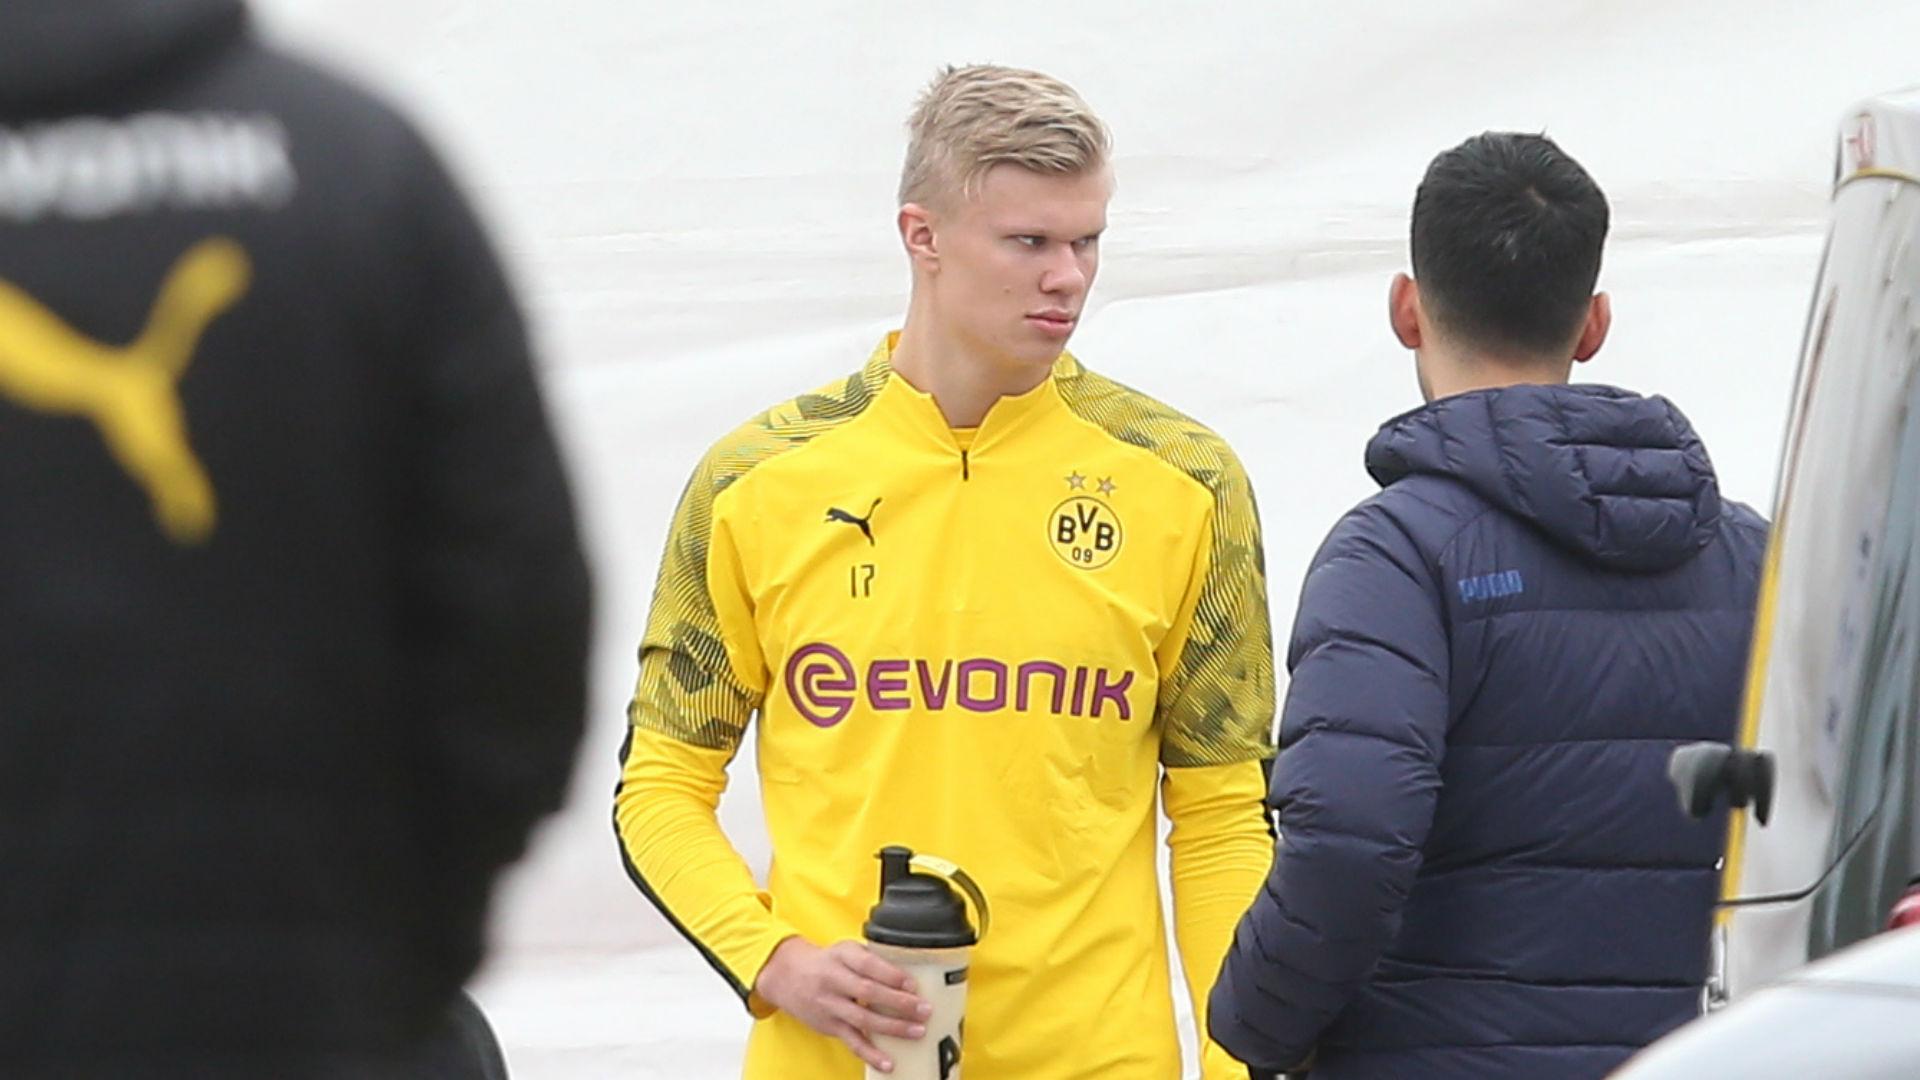 Dortmund haven't had player like Haaland since Lewandowski – Reus